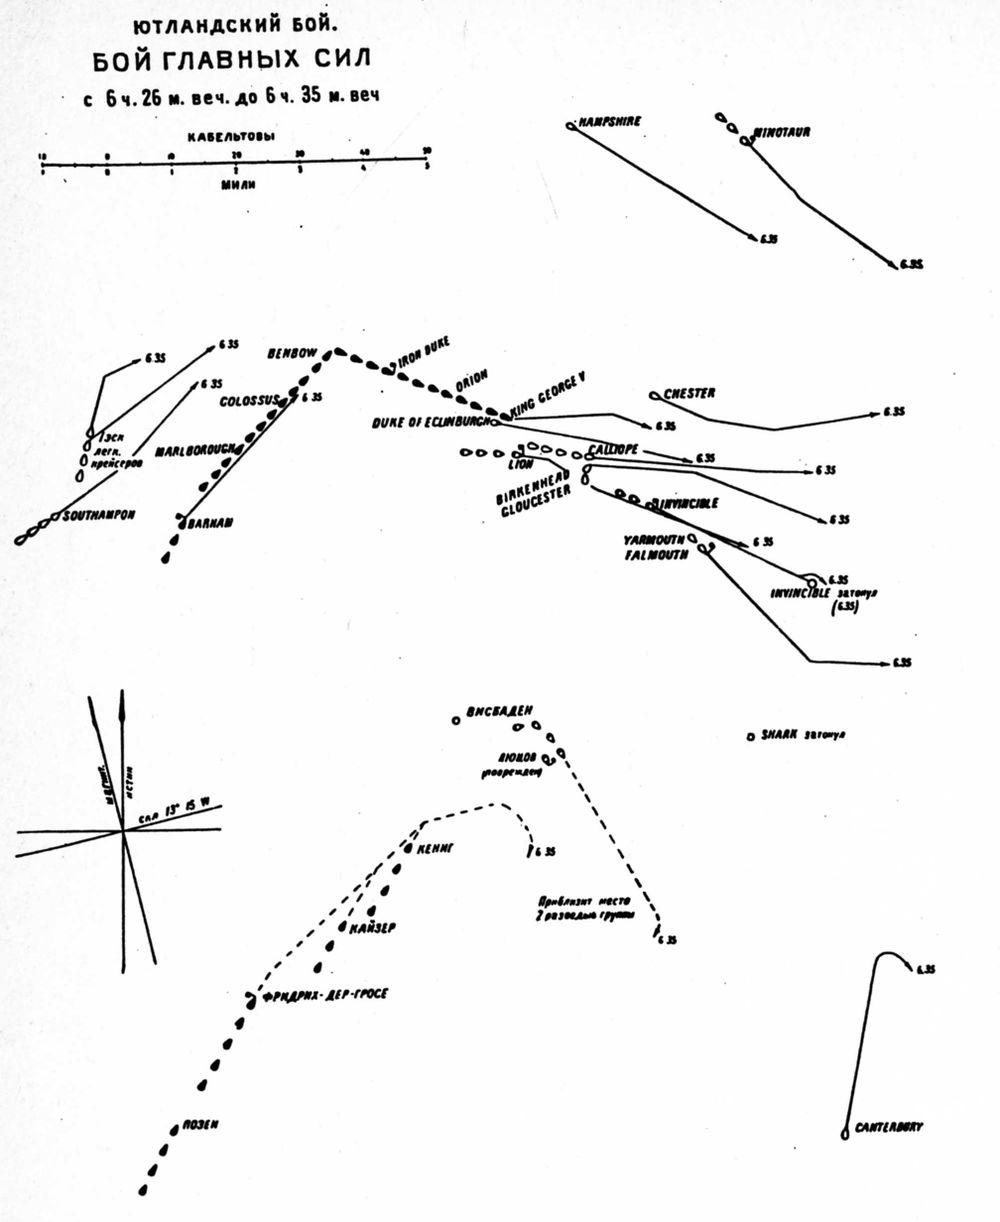 Map_15_(Бой_ГС_626-635).jpg